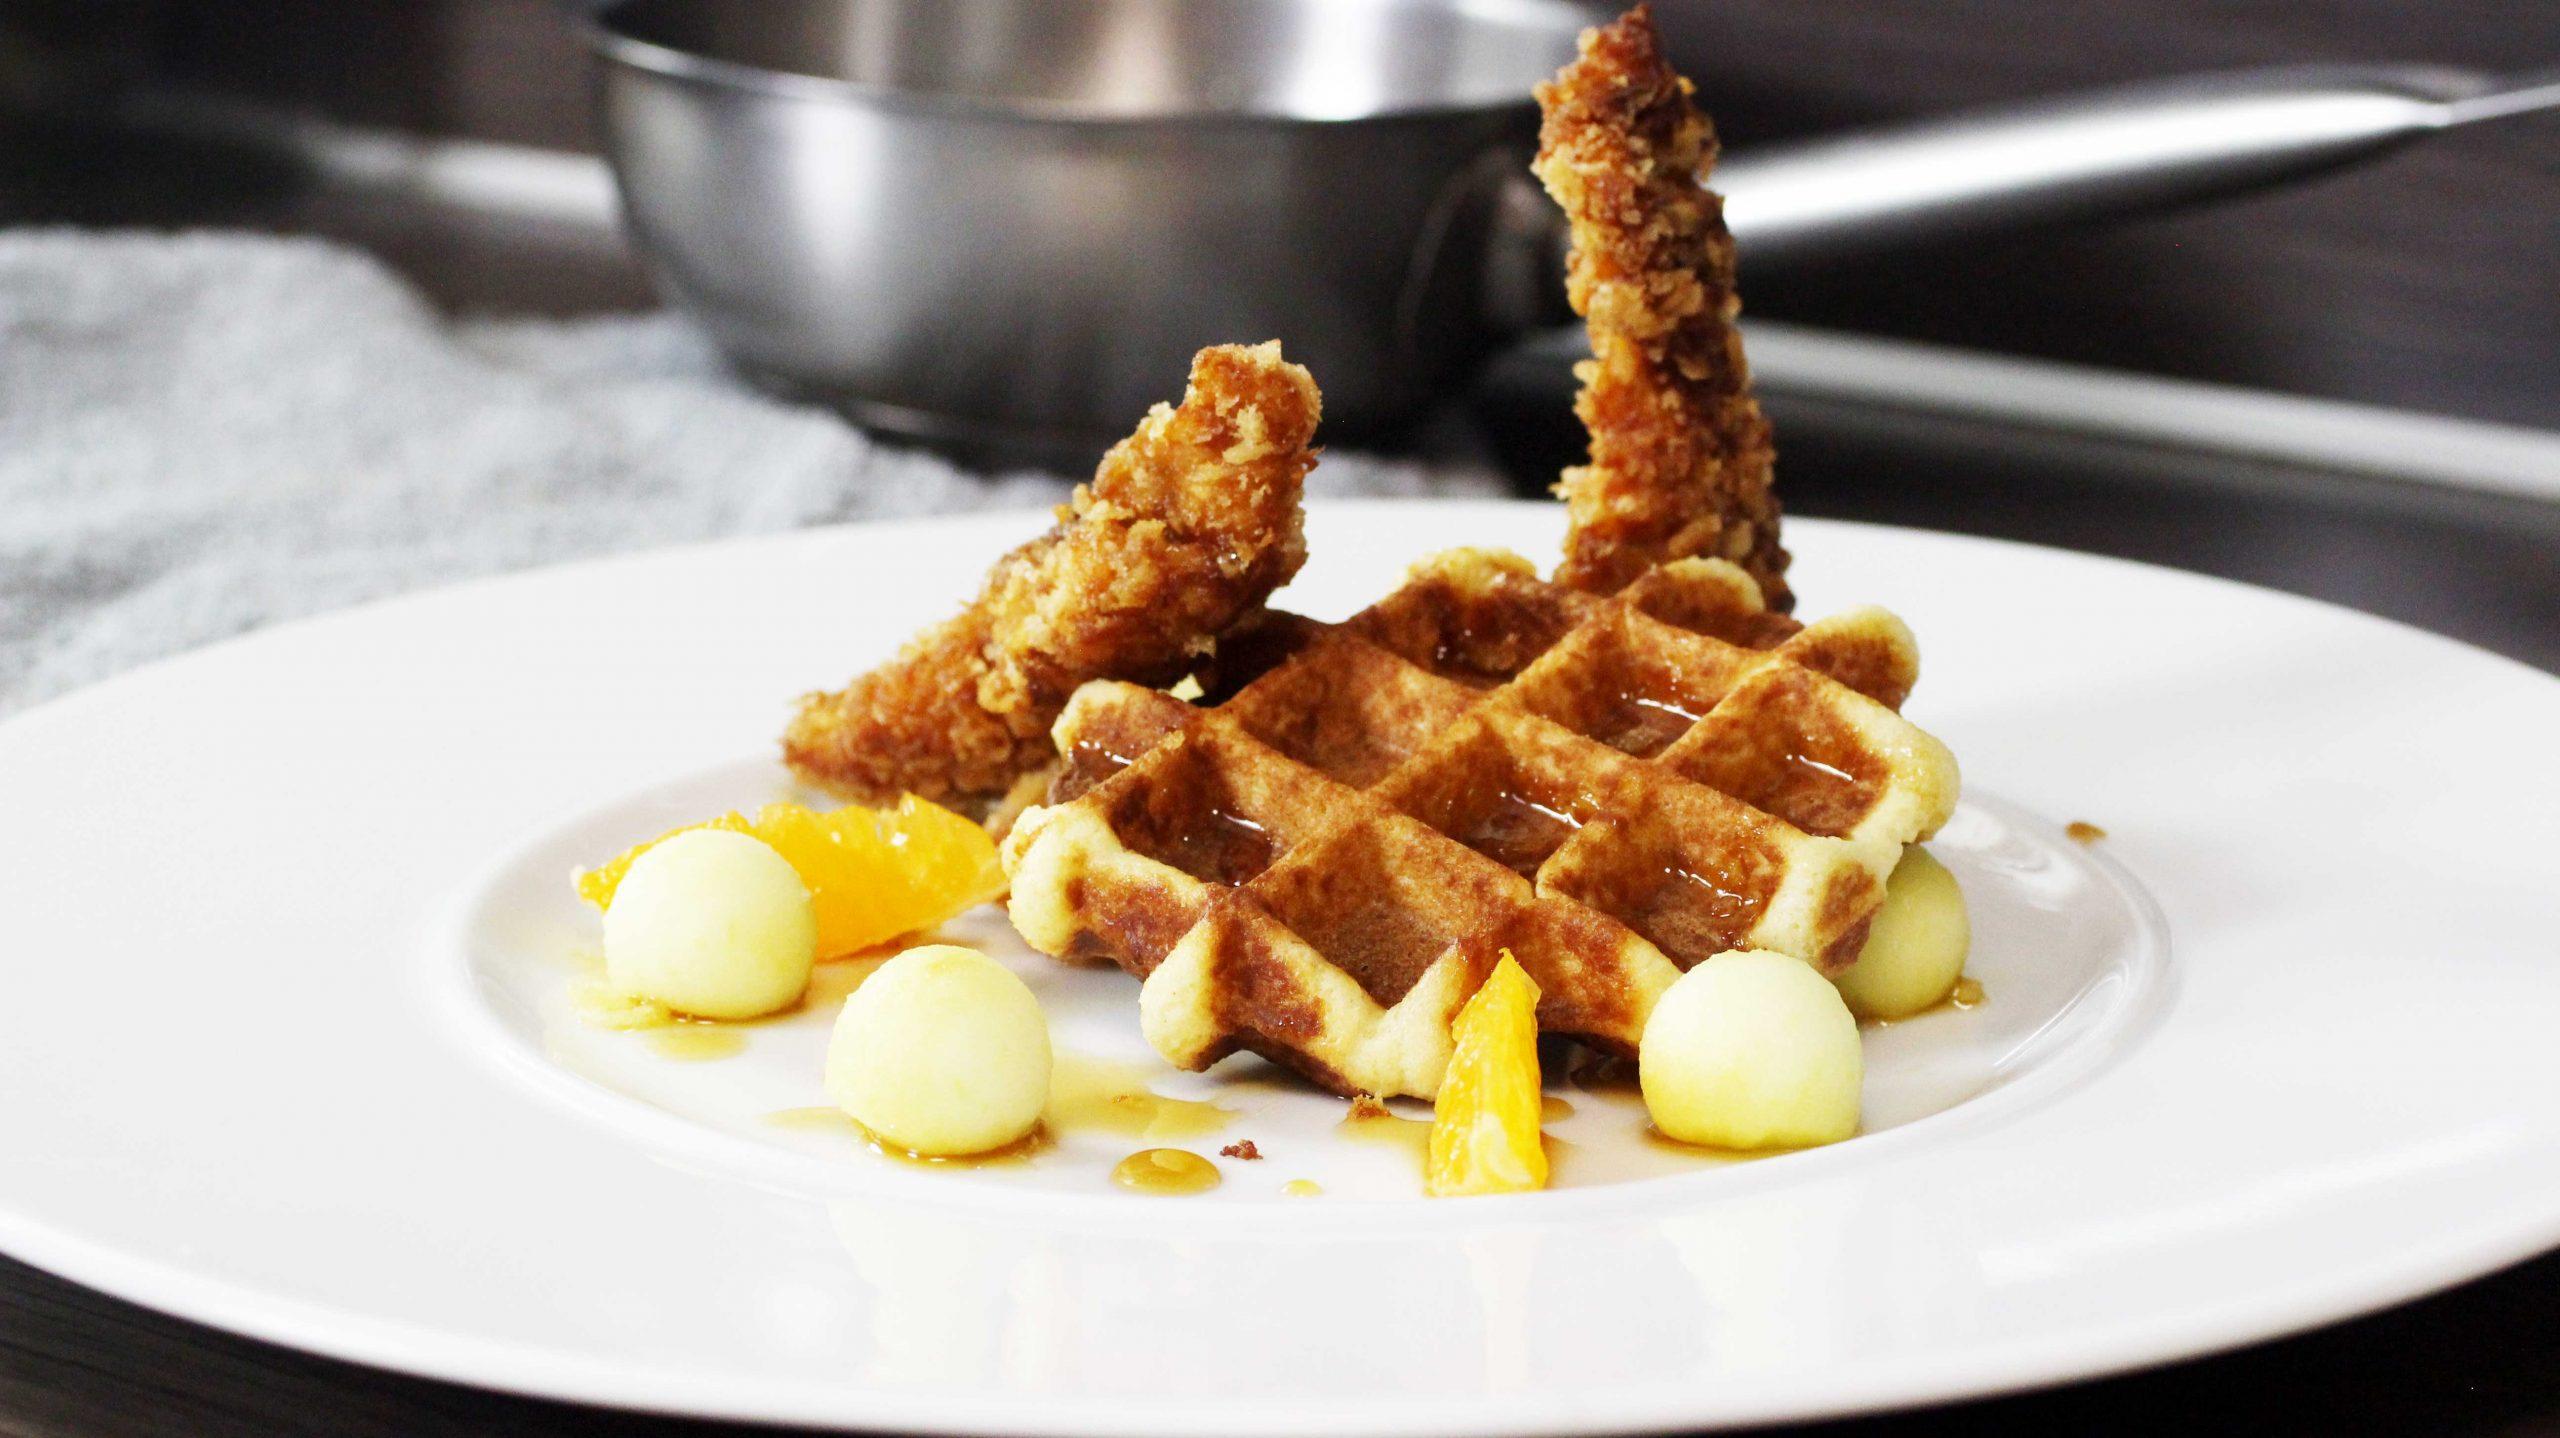 Chicken and waffles recept oftewel kip en wafels maken